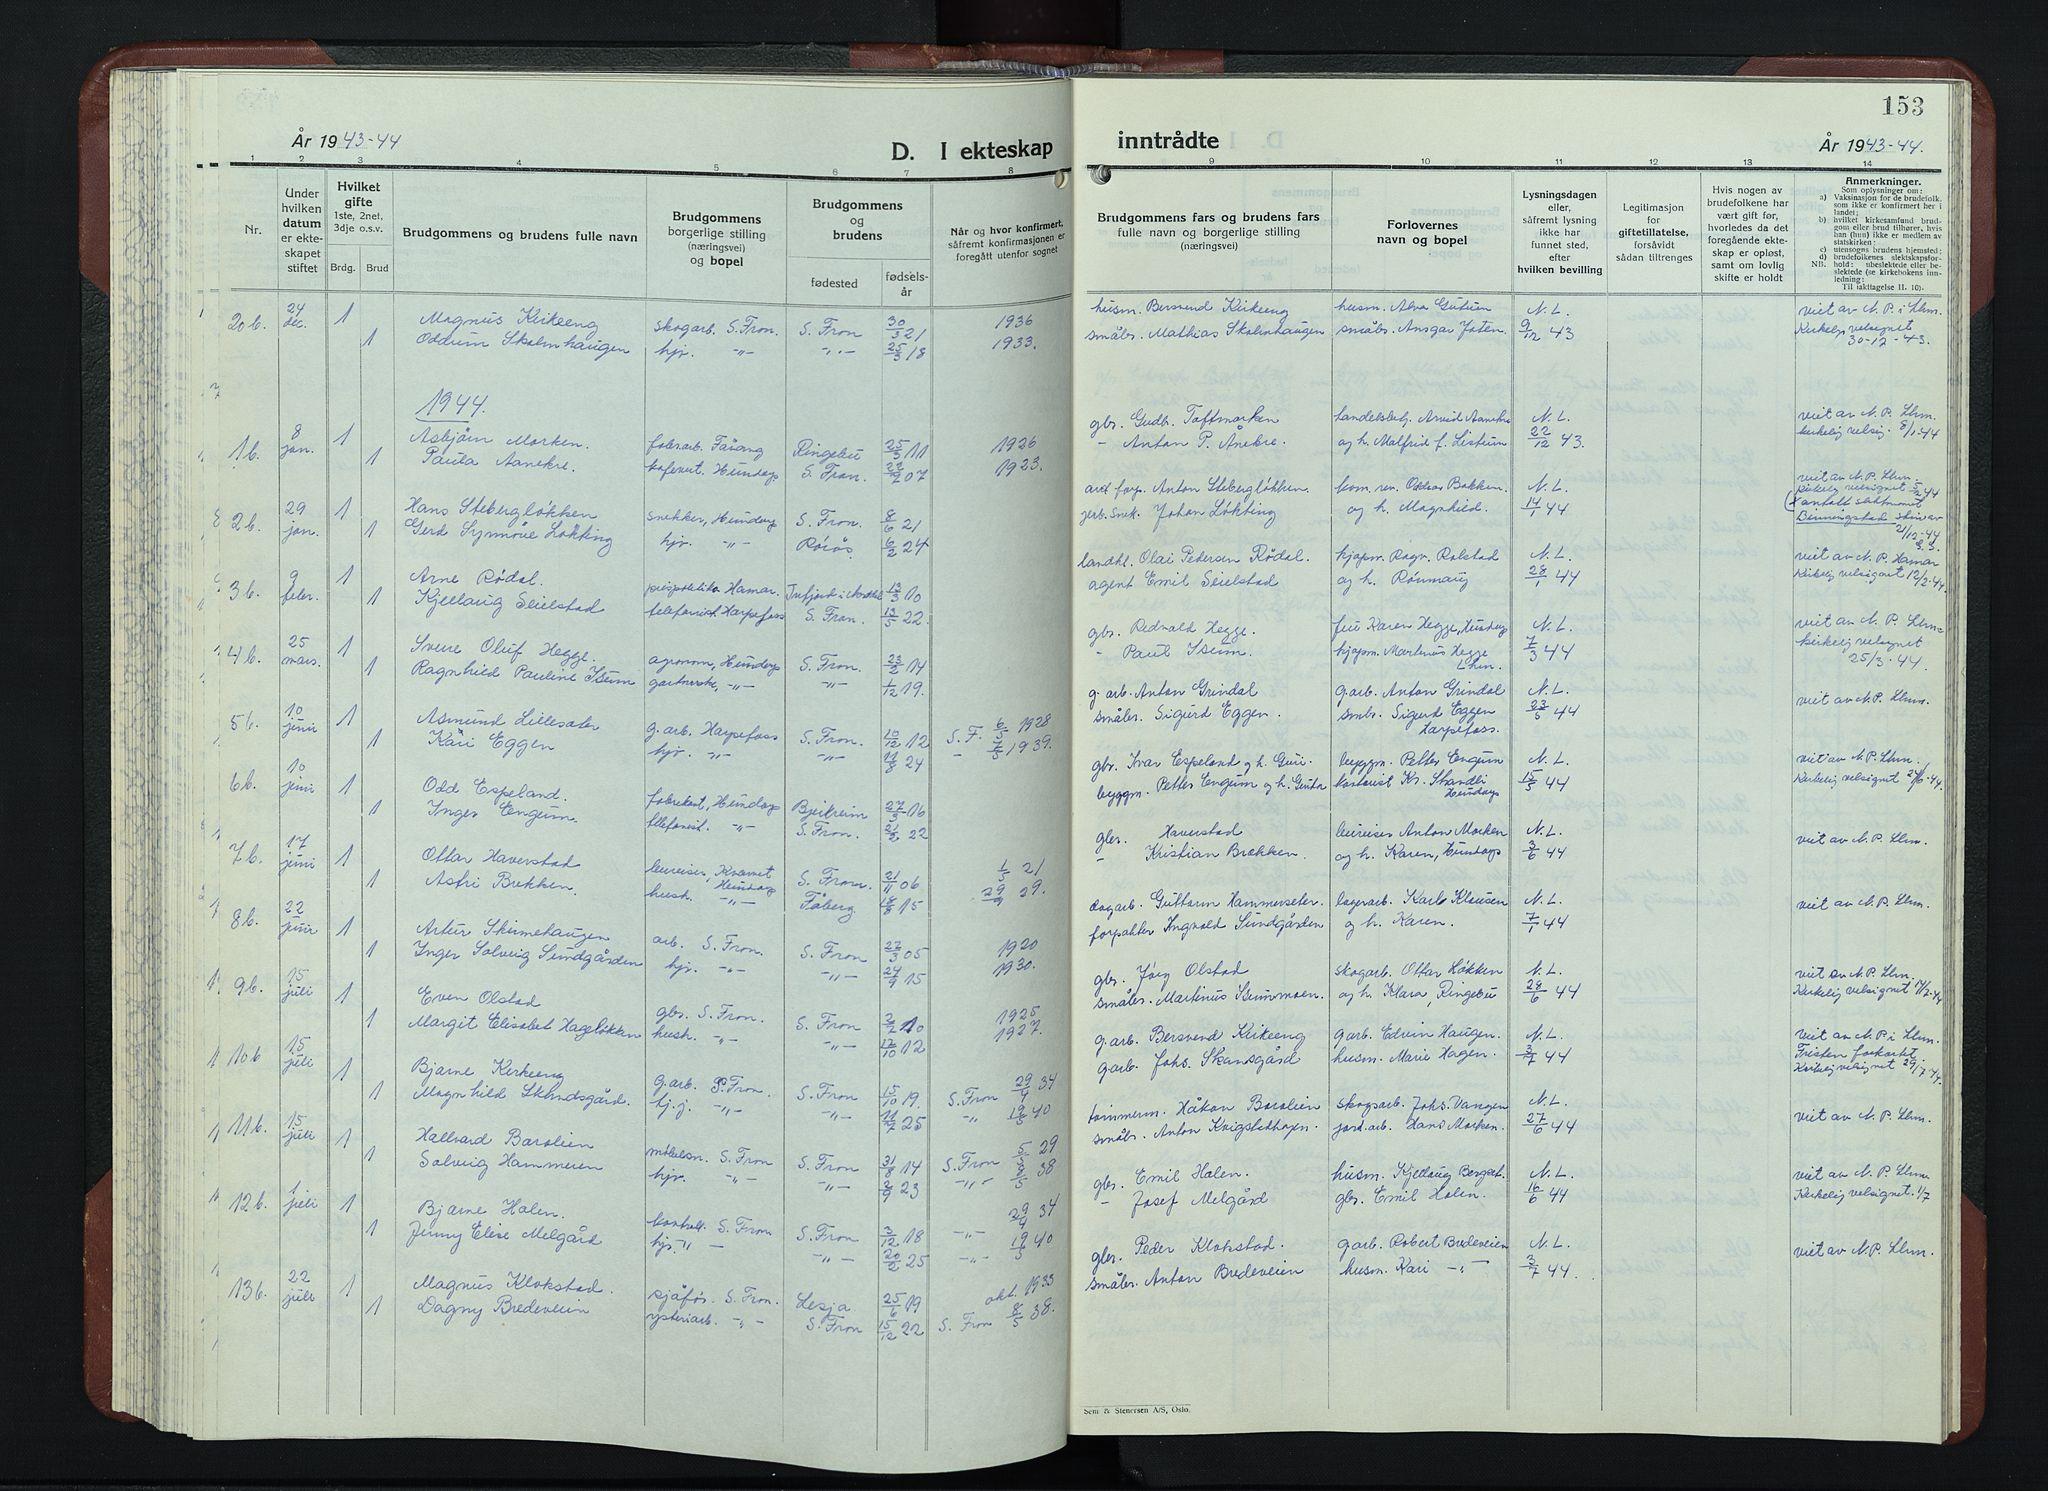 SAH, Sør-Fron prestekontor, H/Ha/Hab/L0006: Klokkerbok nr. 6, 1933-1948, s. 153